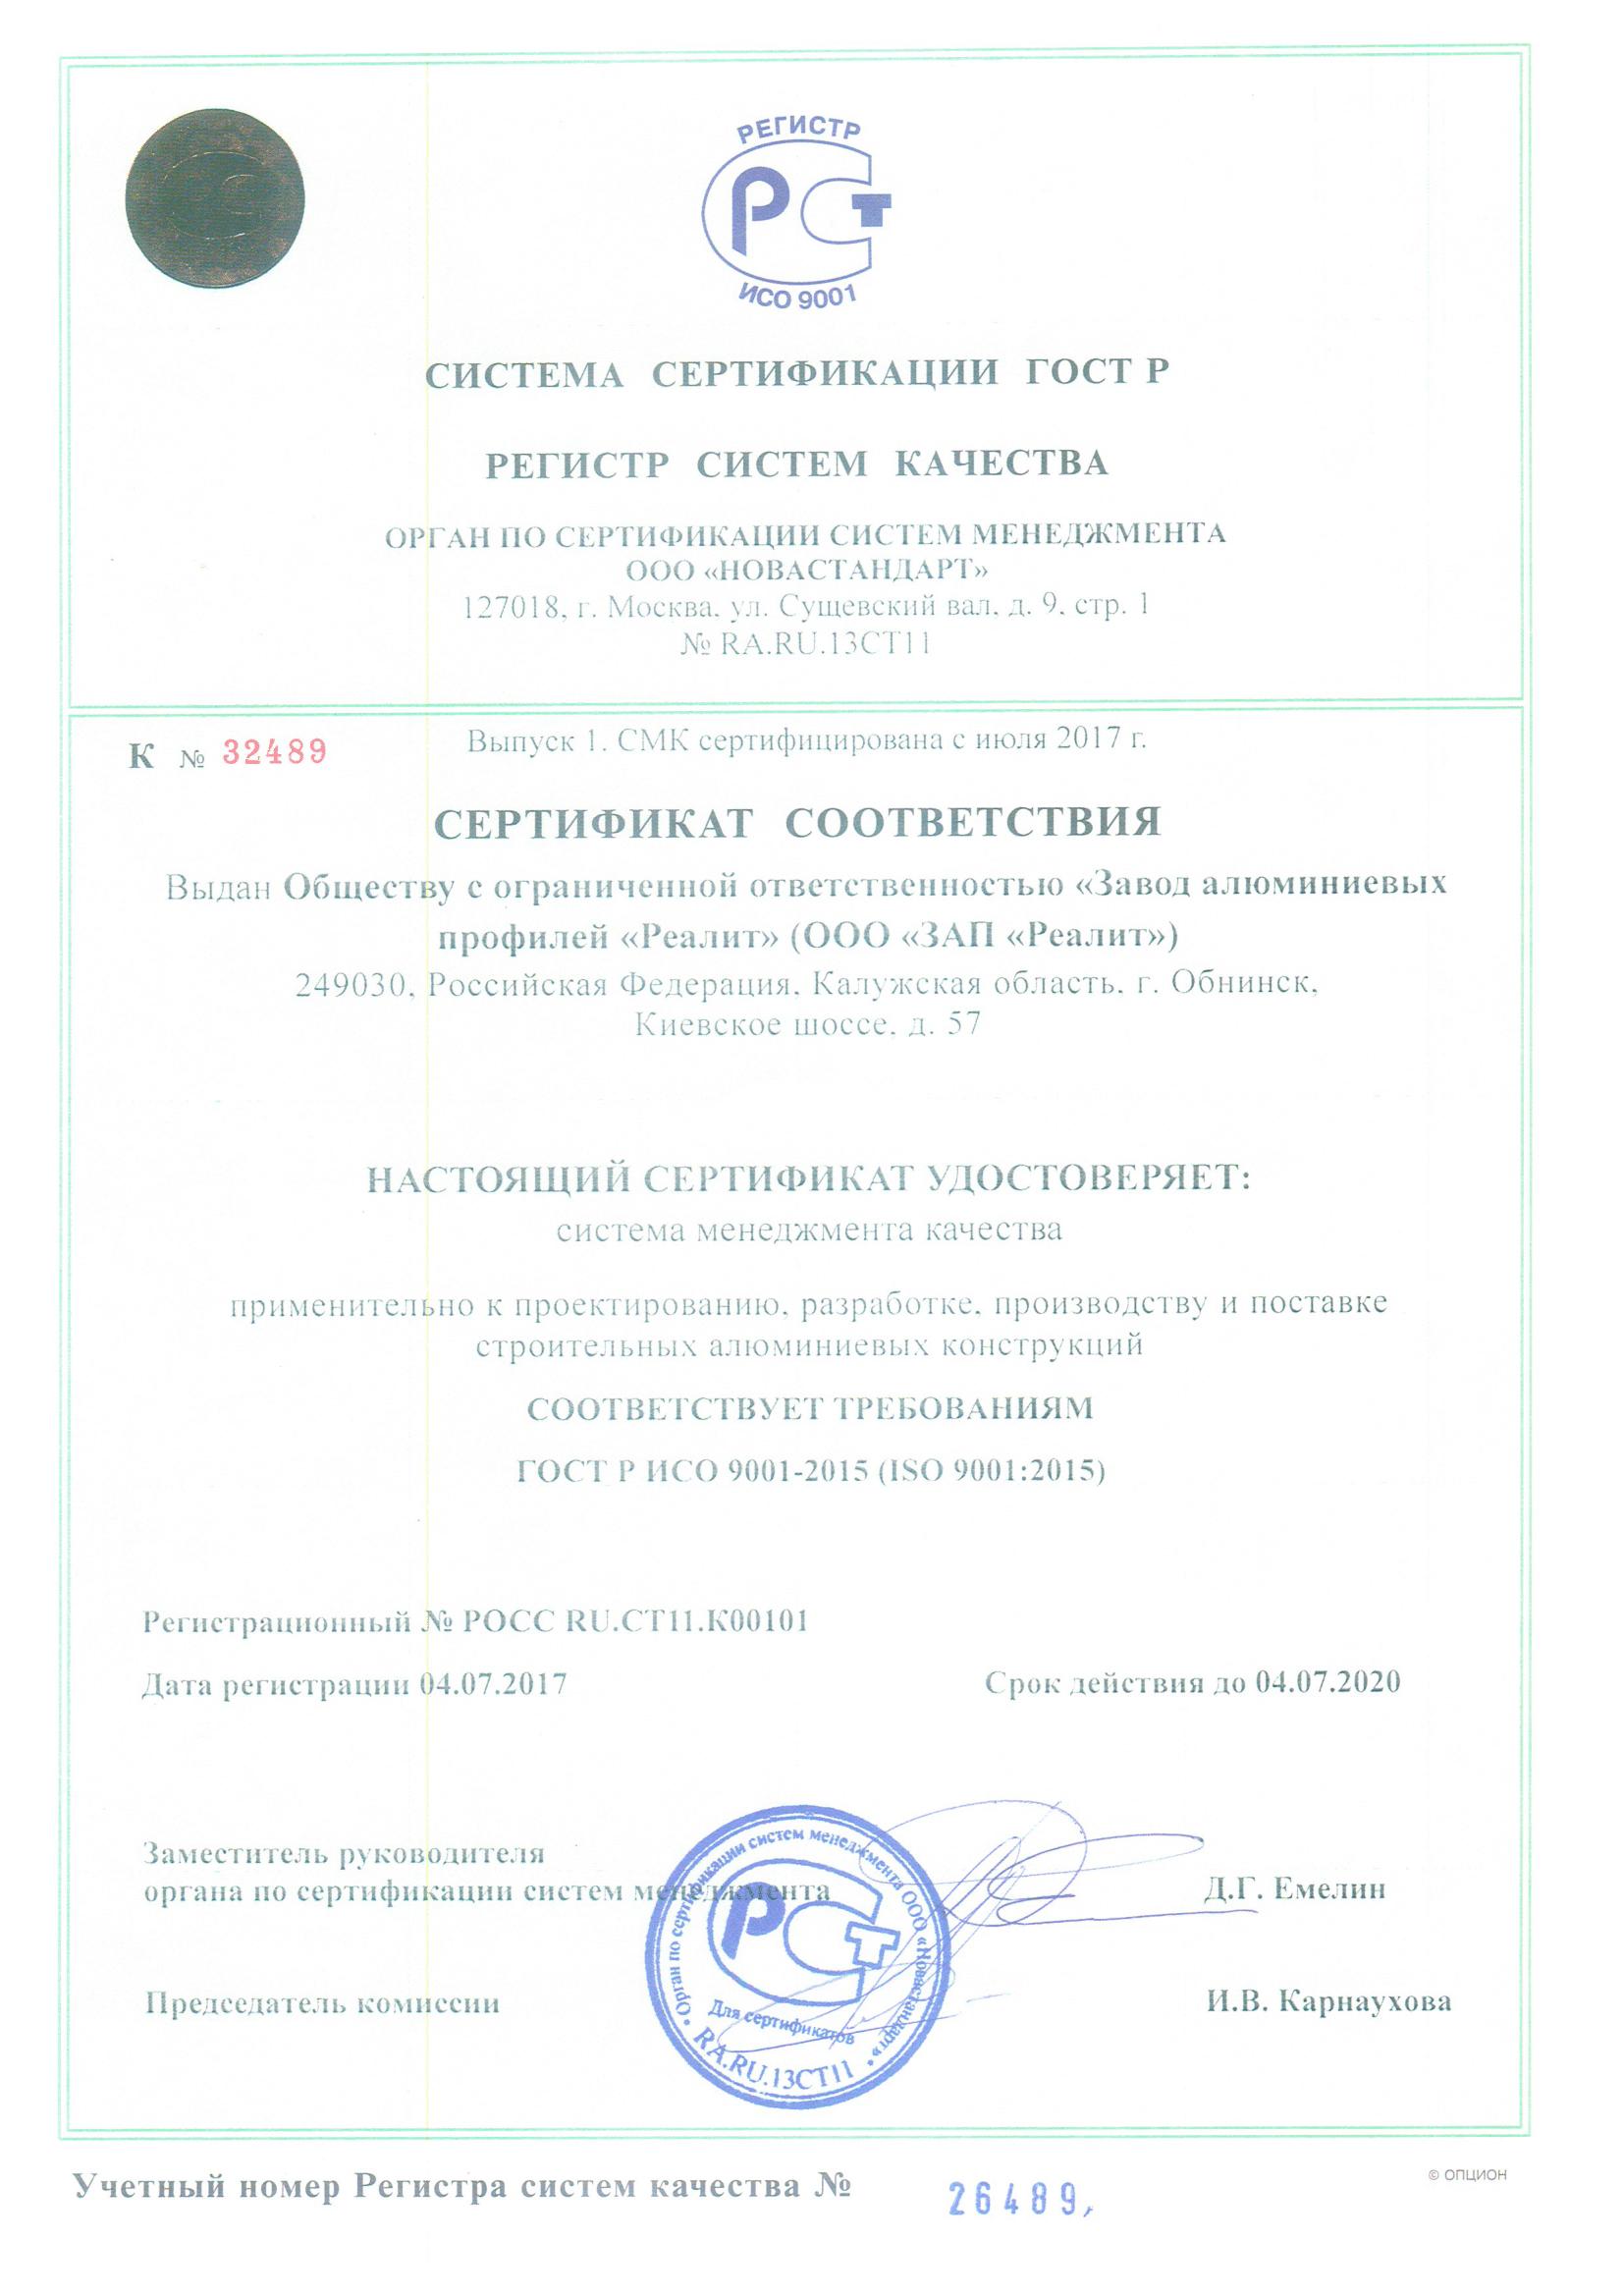 sertificate